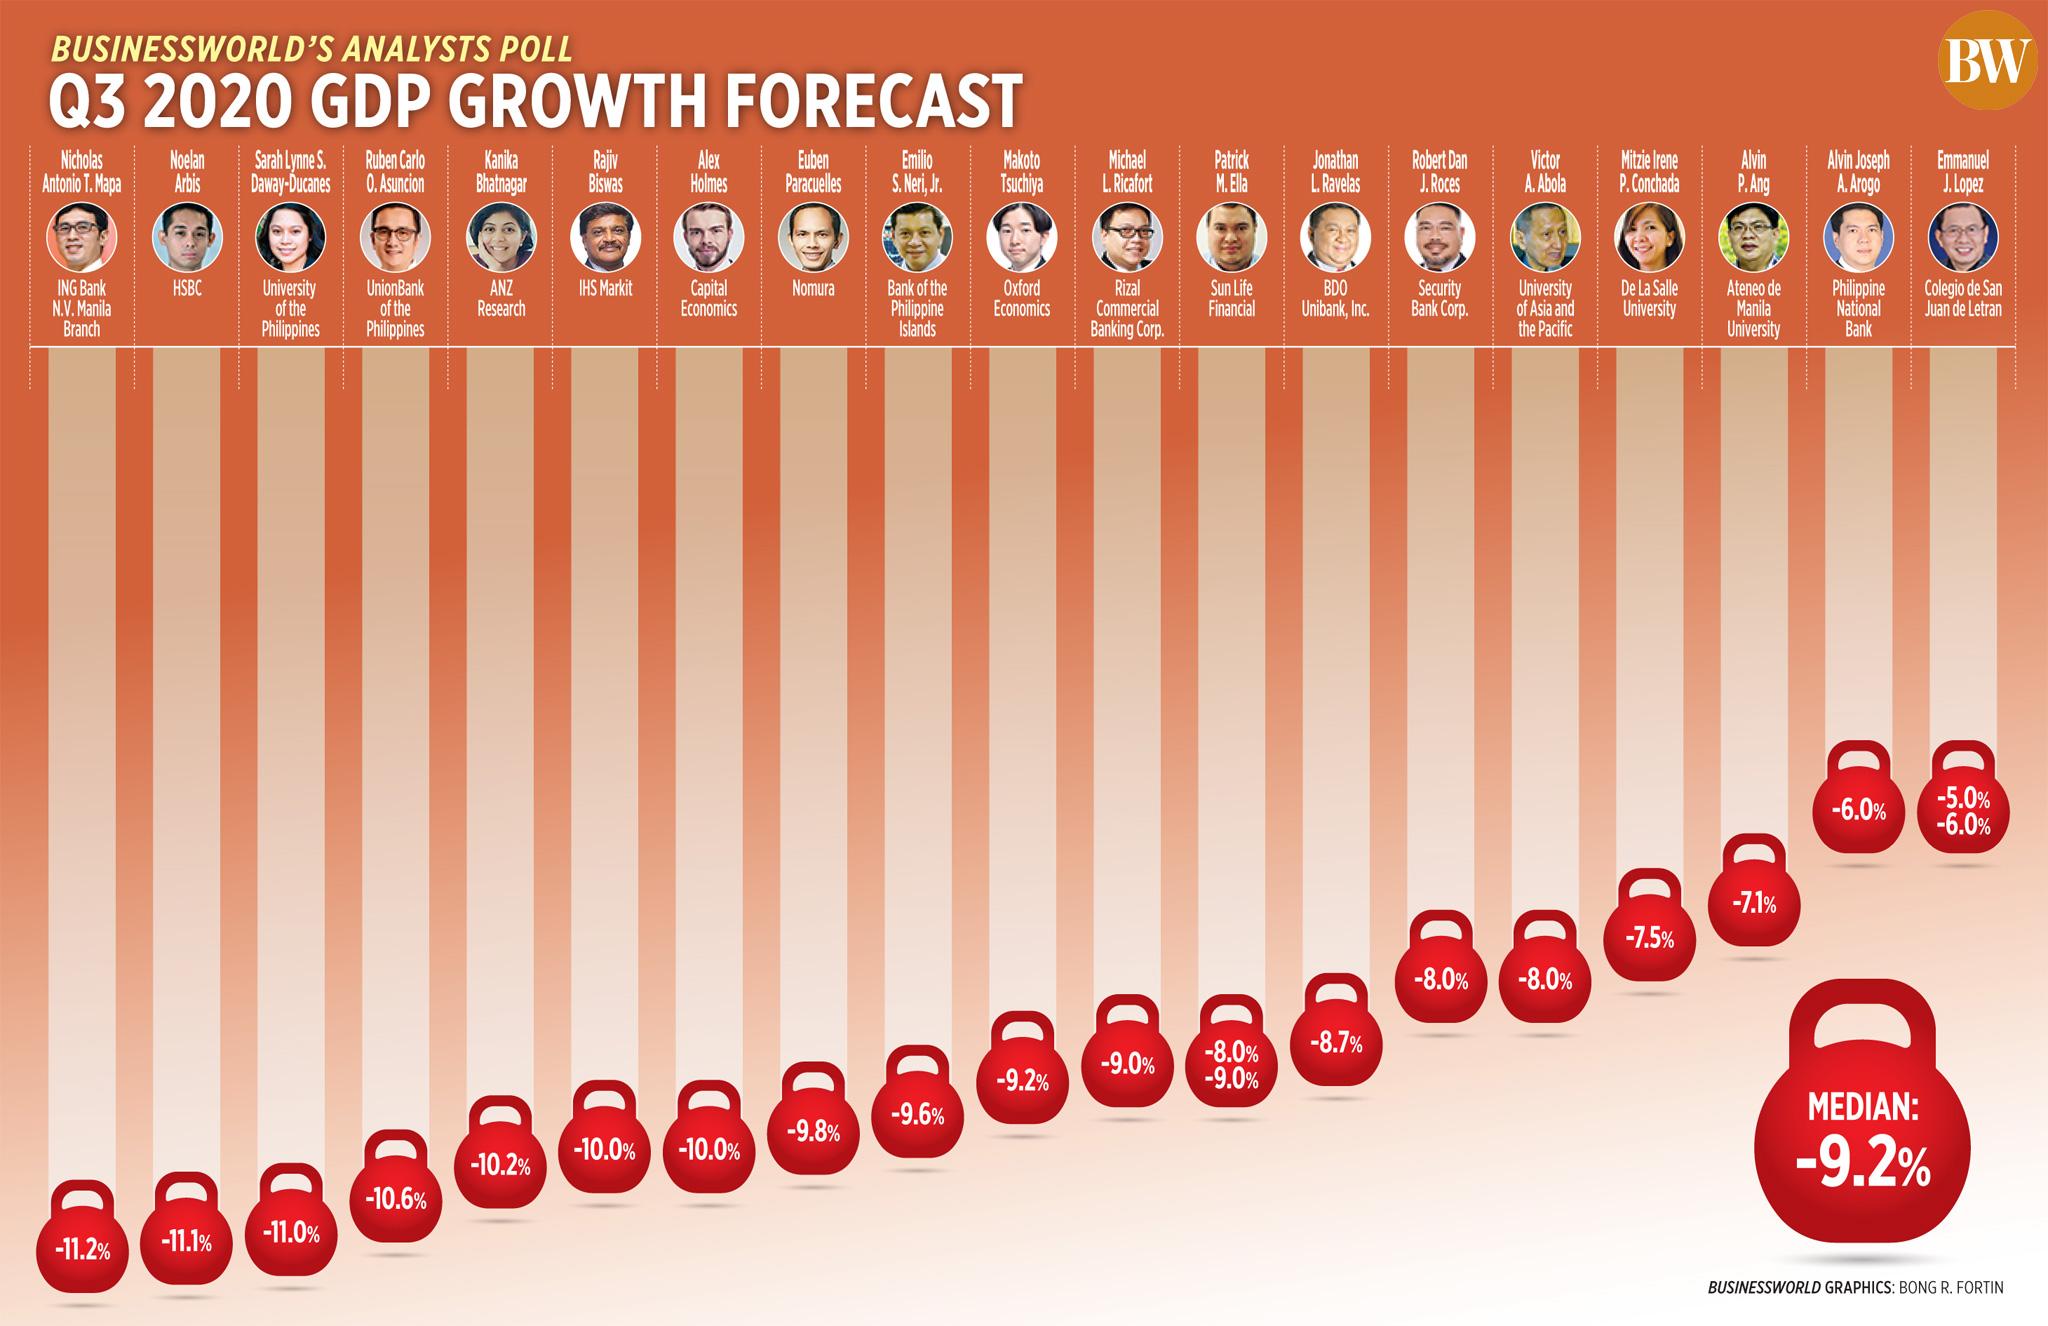 Q3 2020 GDP growth forecast